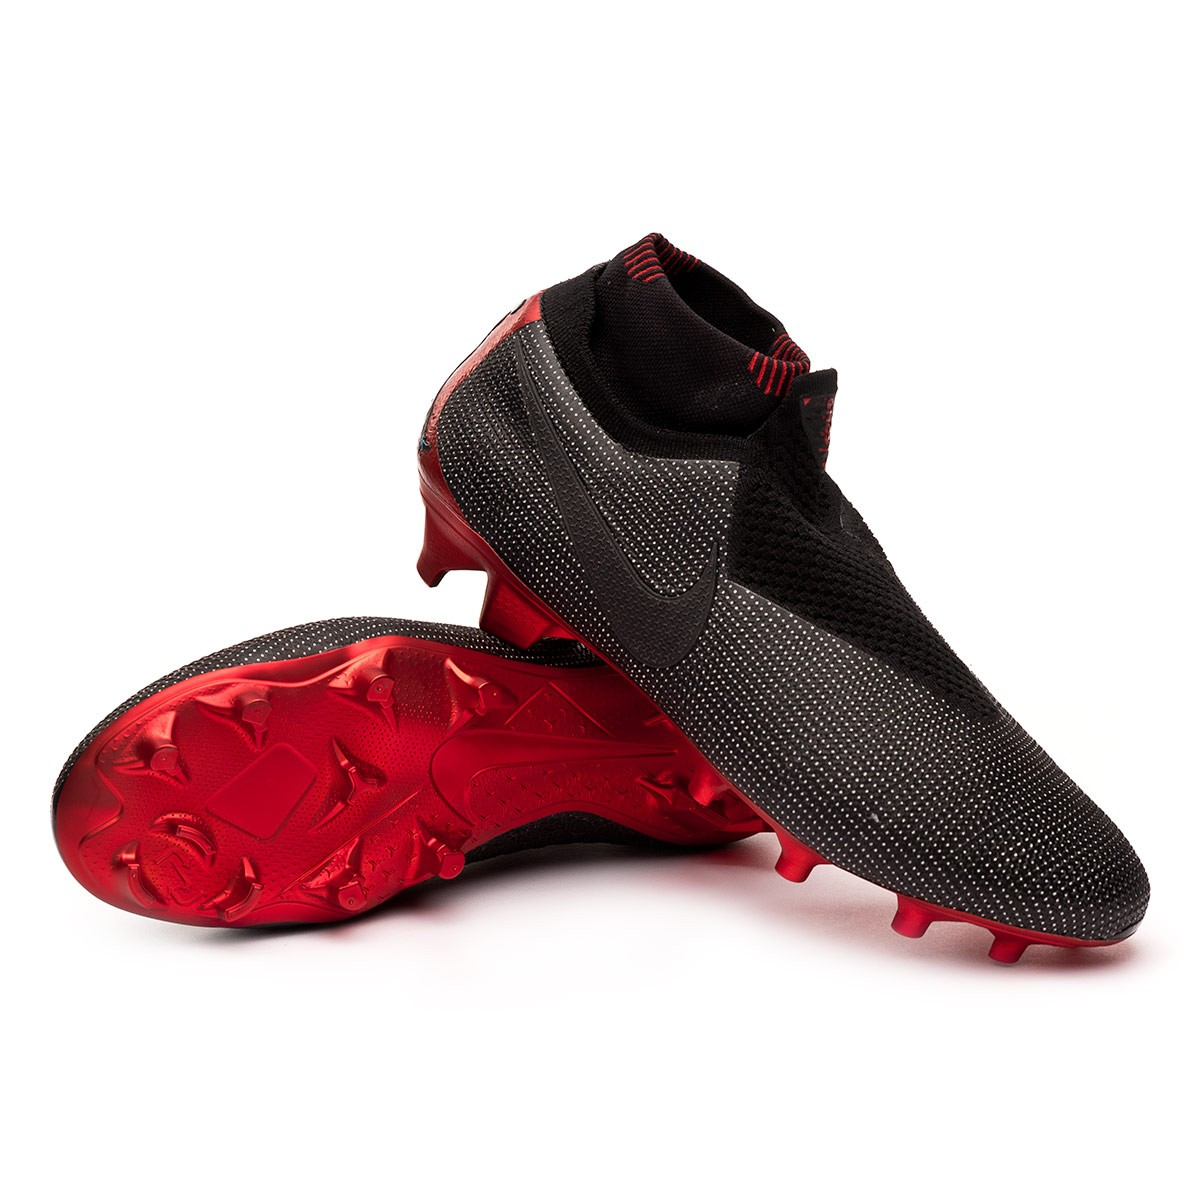 Boot Nike Phantom Vision Elite DF SE Jordan x PSG FG Black - Football store  Fútbol Emotion 0405bc8da